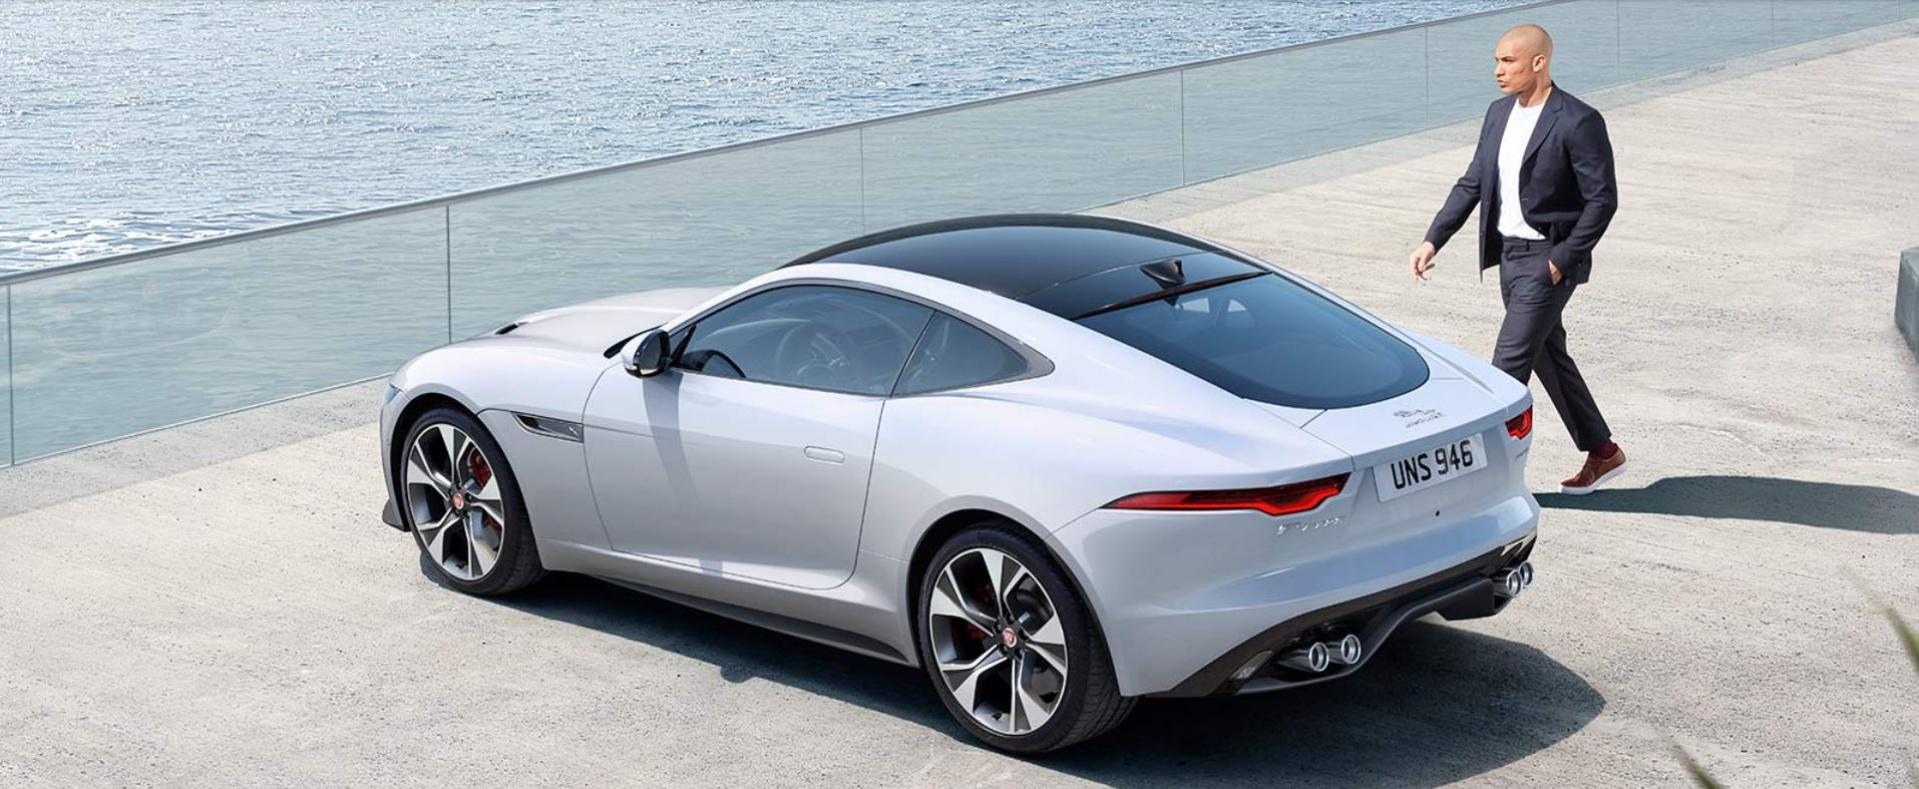 Jaguar-F-Type Coupe-3